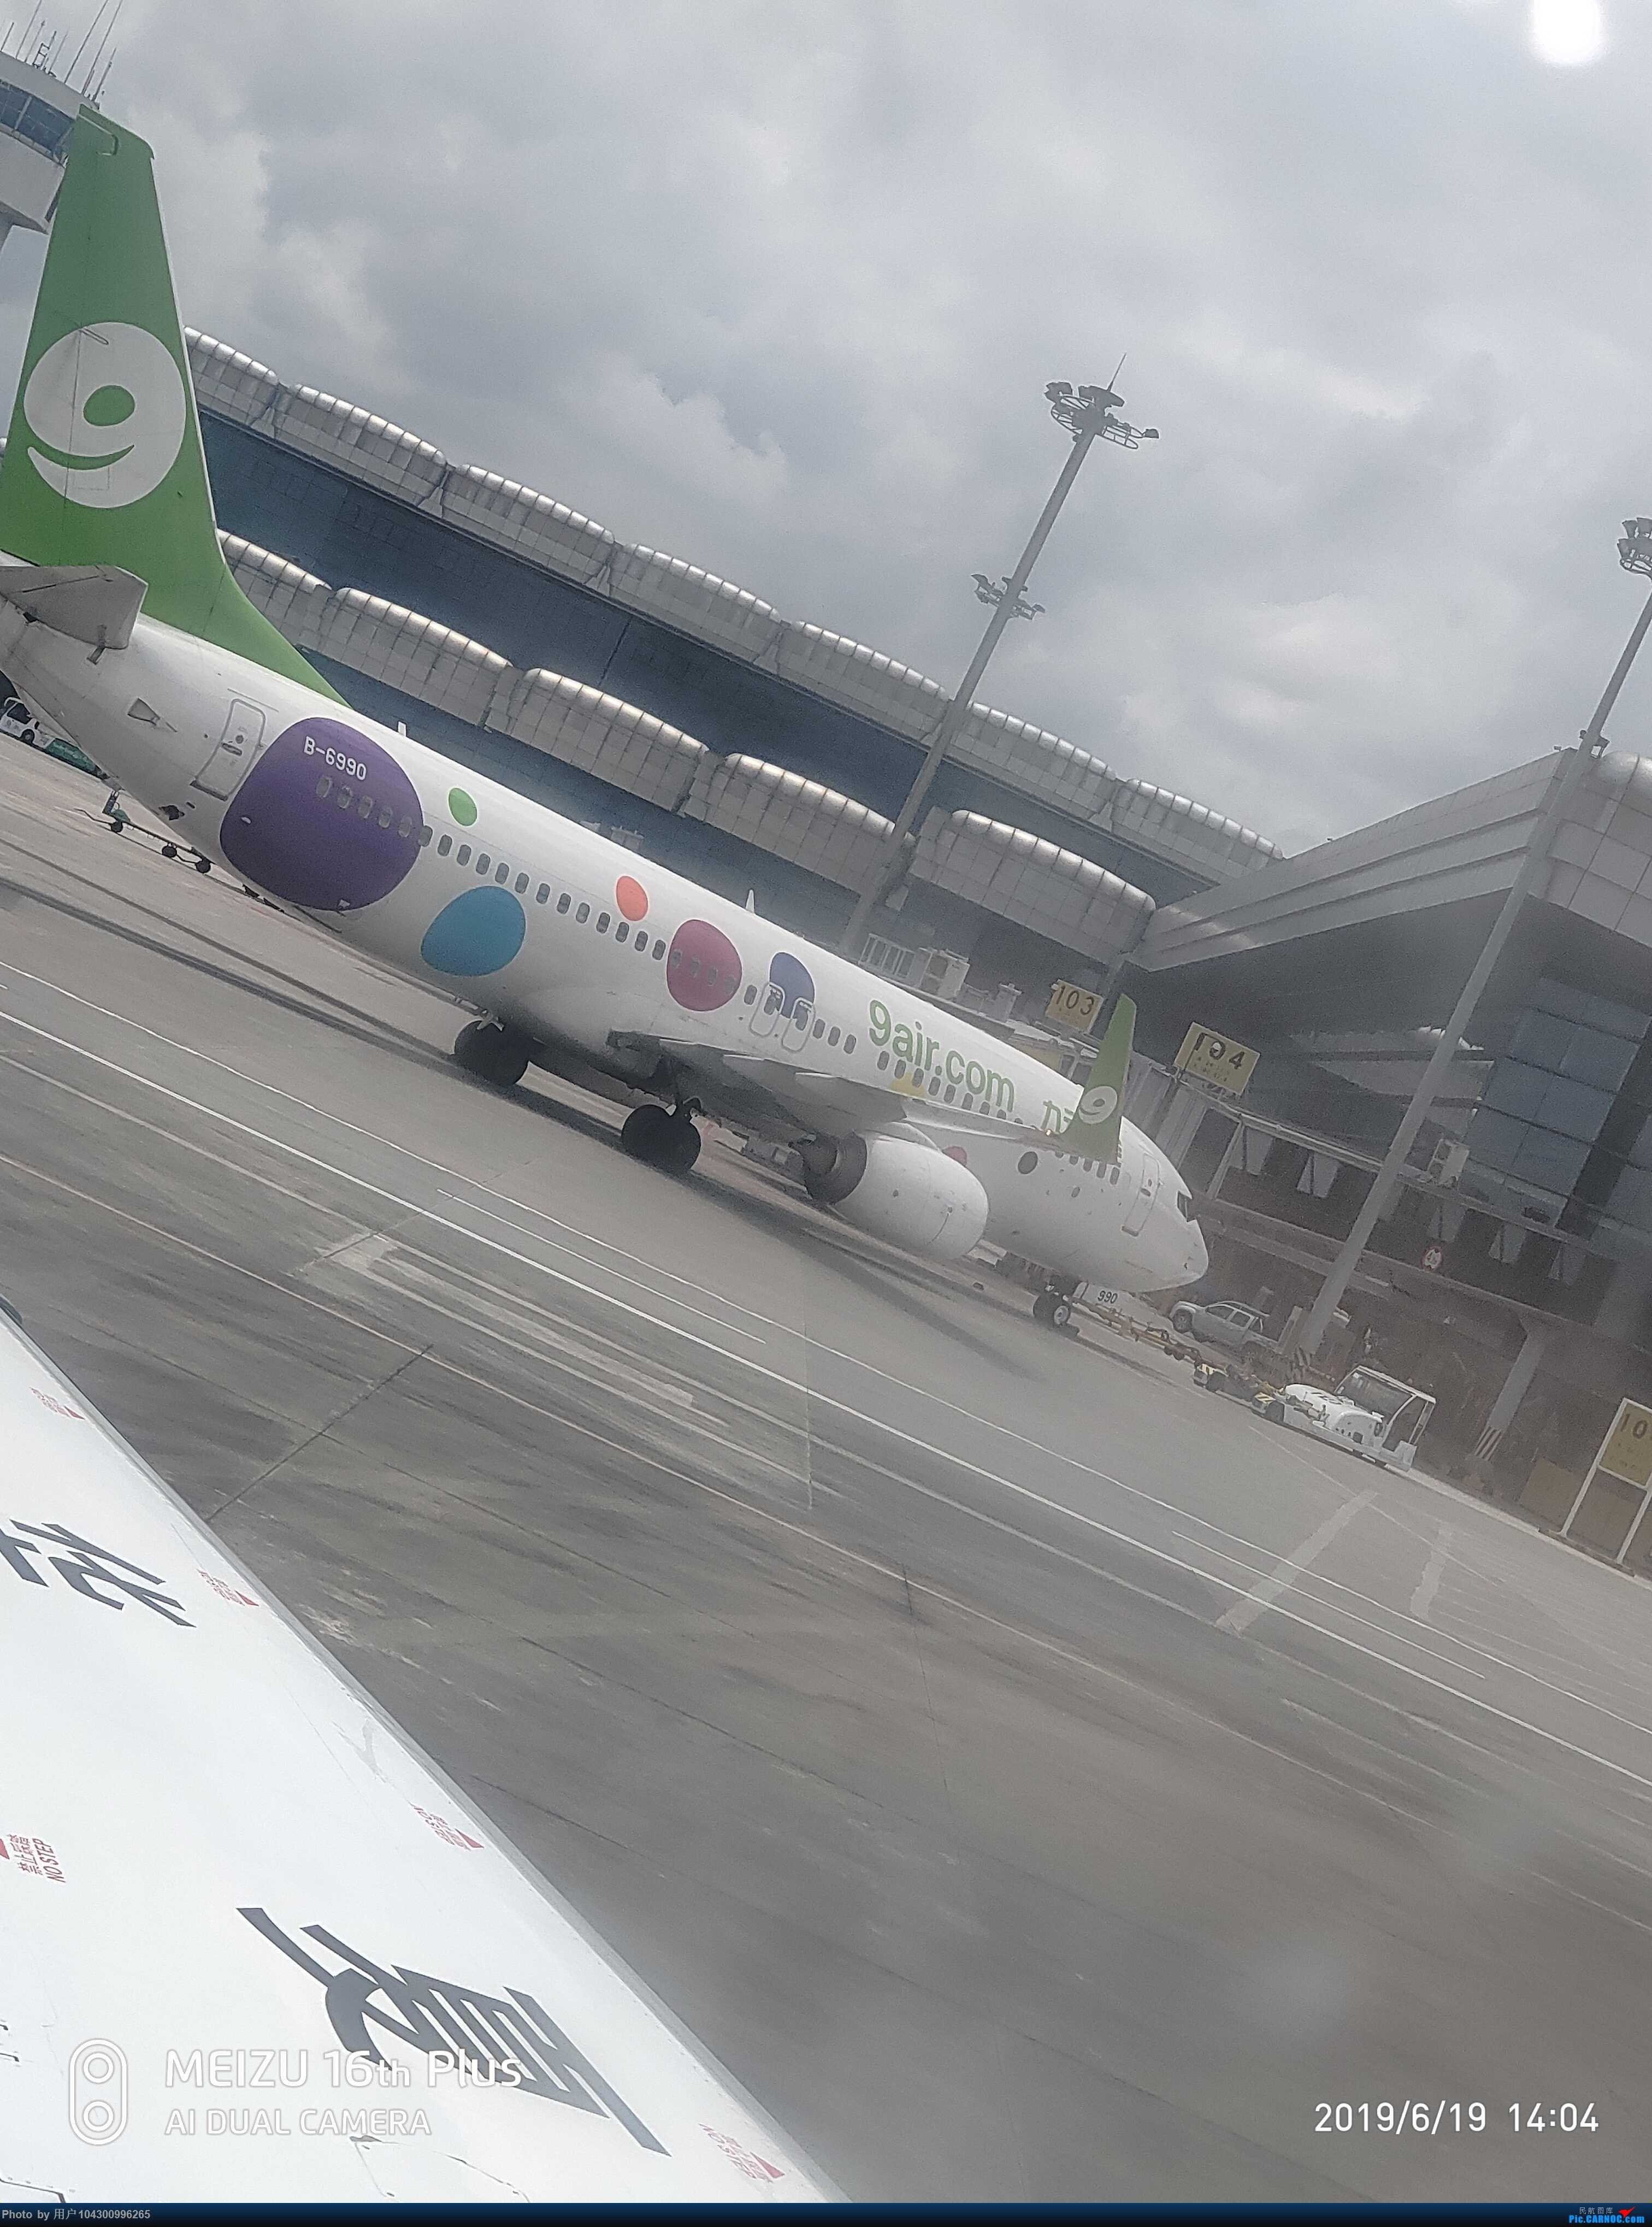 Re:[原创]DM哥飞行游记--贵阳往返荔波2日游 BOEING 737-800 B-6990 中国贵阳龙洞堡国际机场